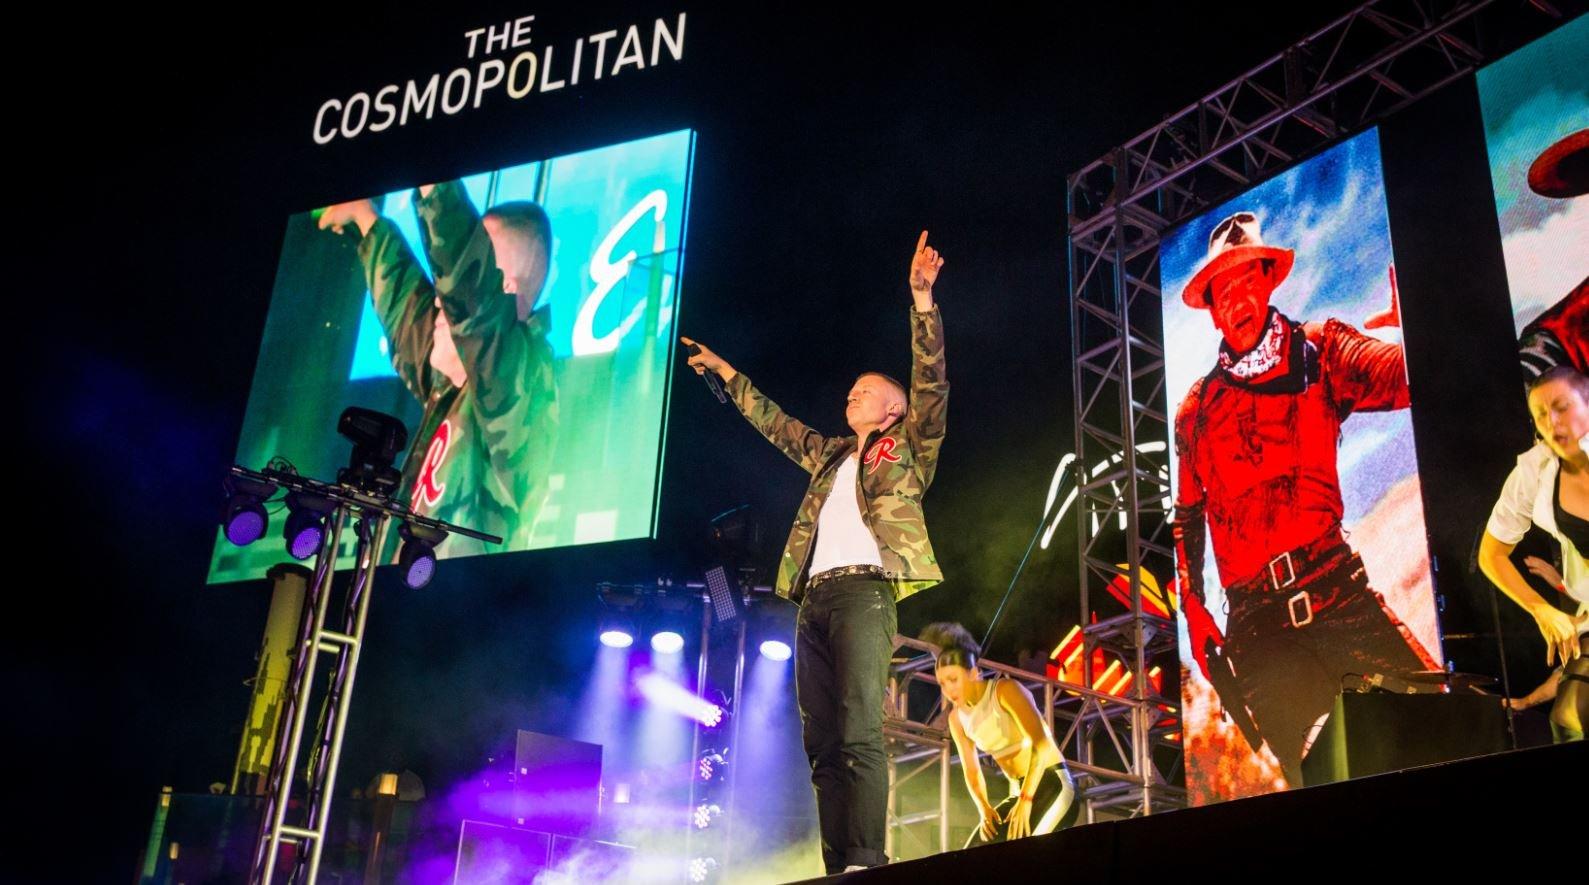 Macklemore & Ryan Lewis perform at The Boulevard Pool at The Cosmopolitan on 09/04/2016.